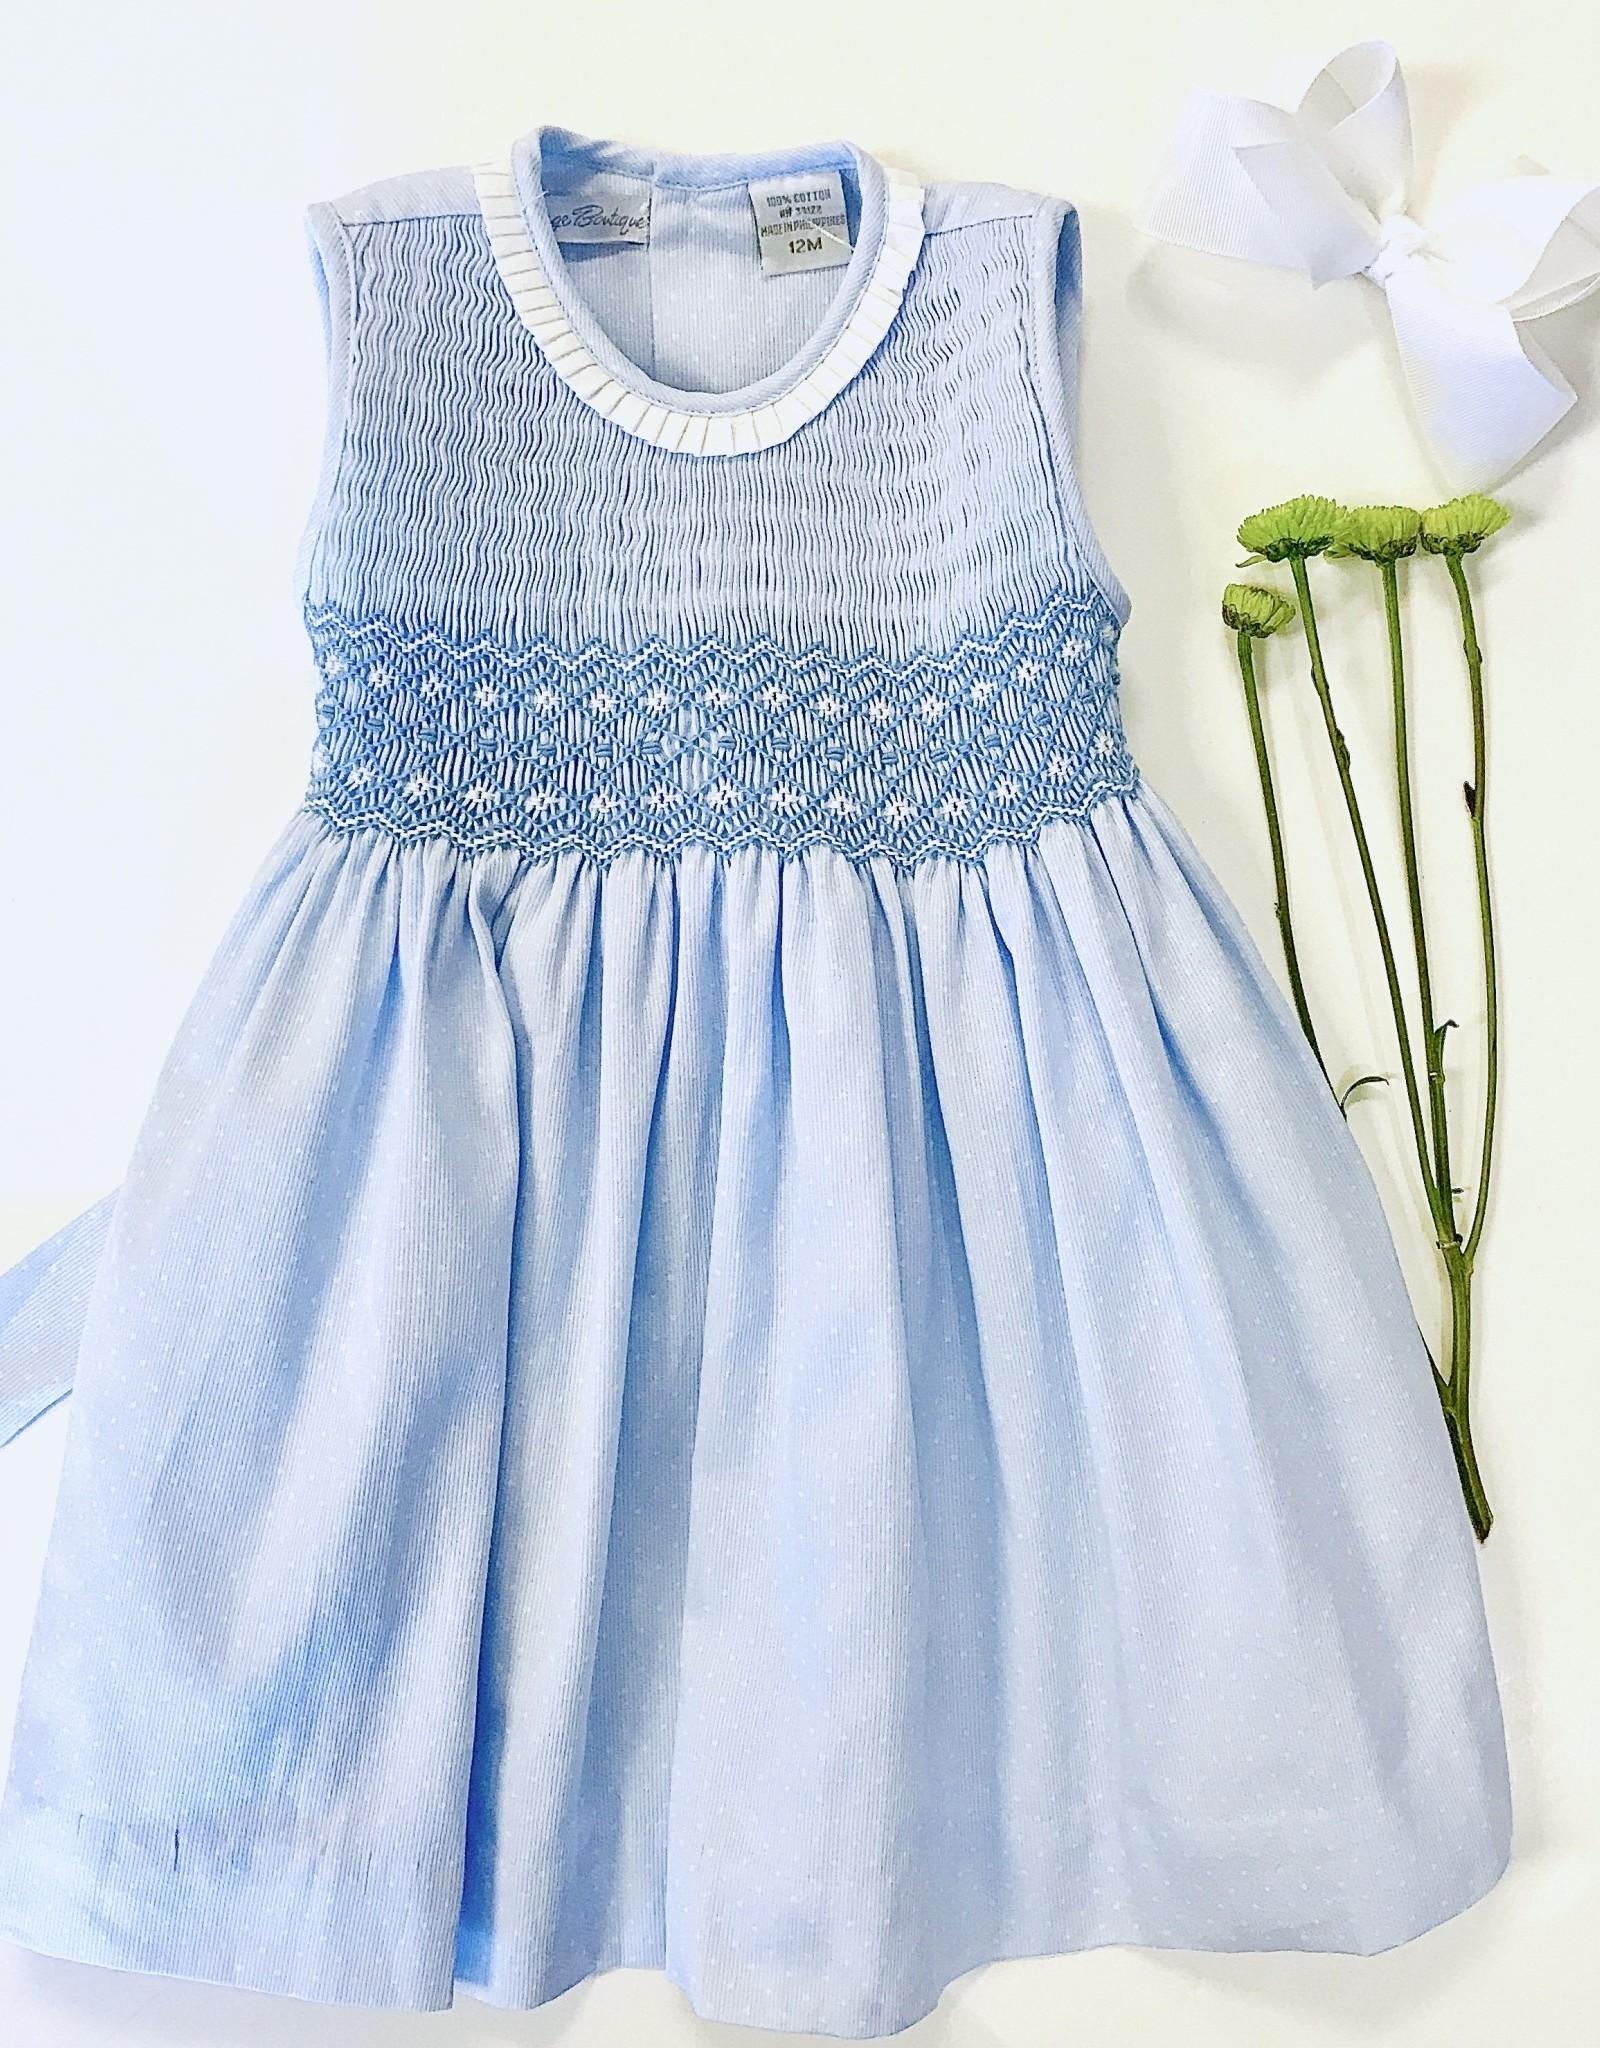 Boutique Collection LtBlue Pique Smocked Dress